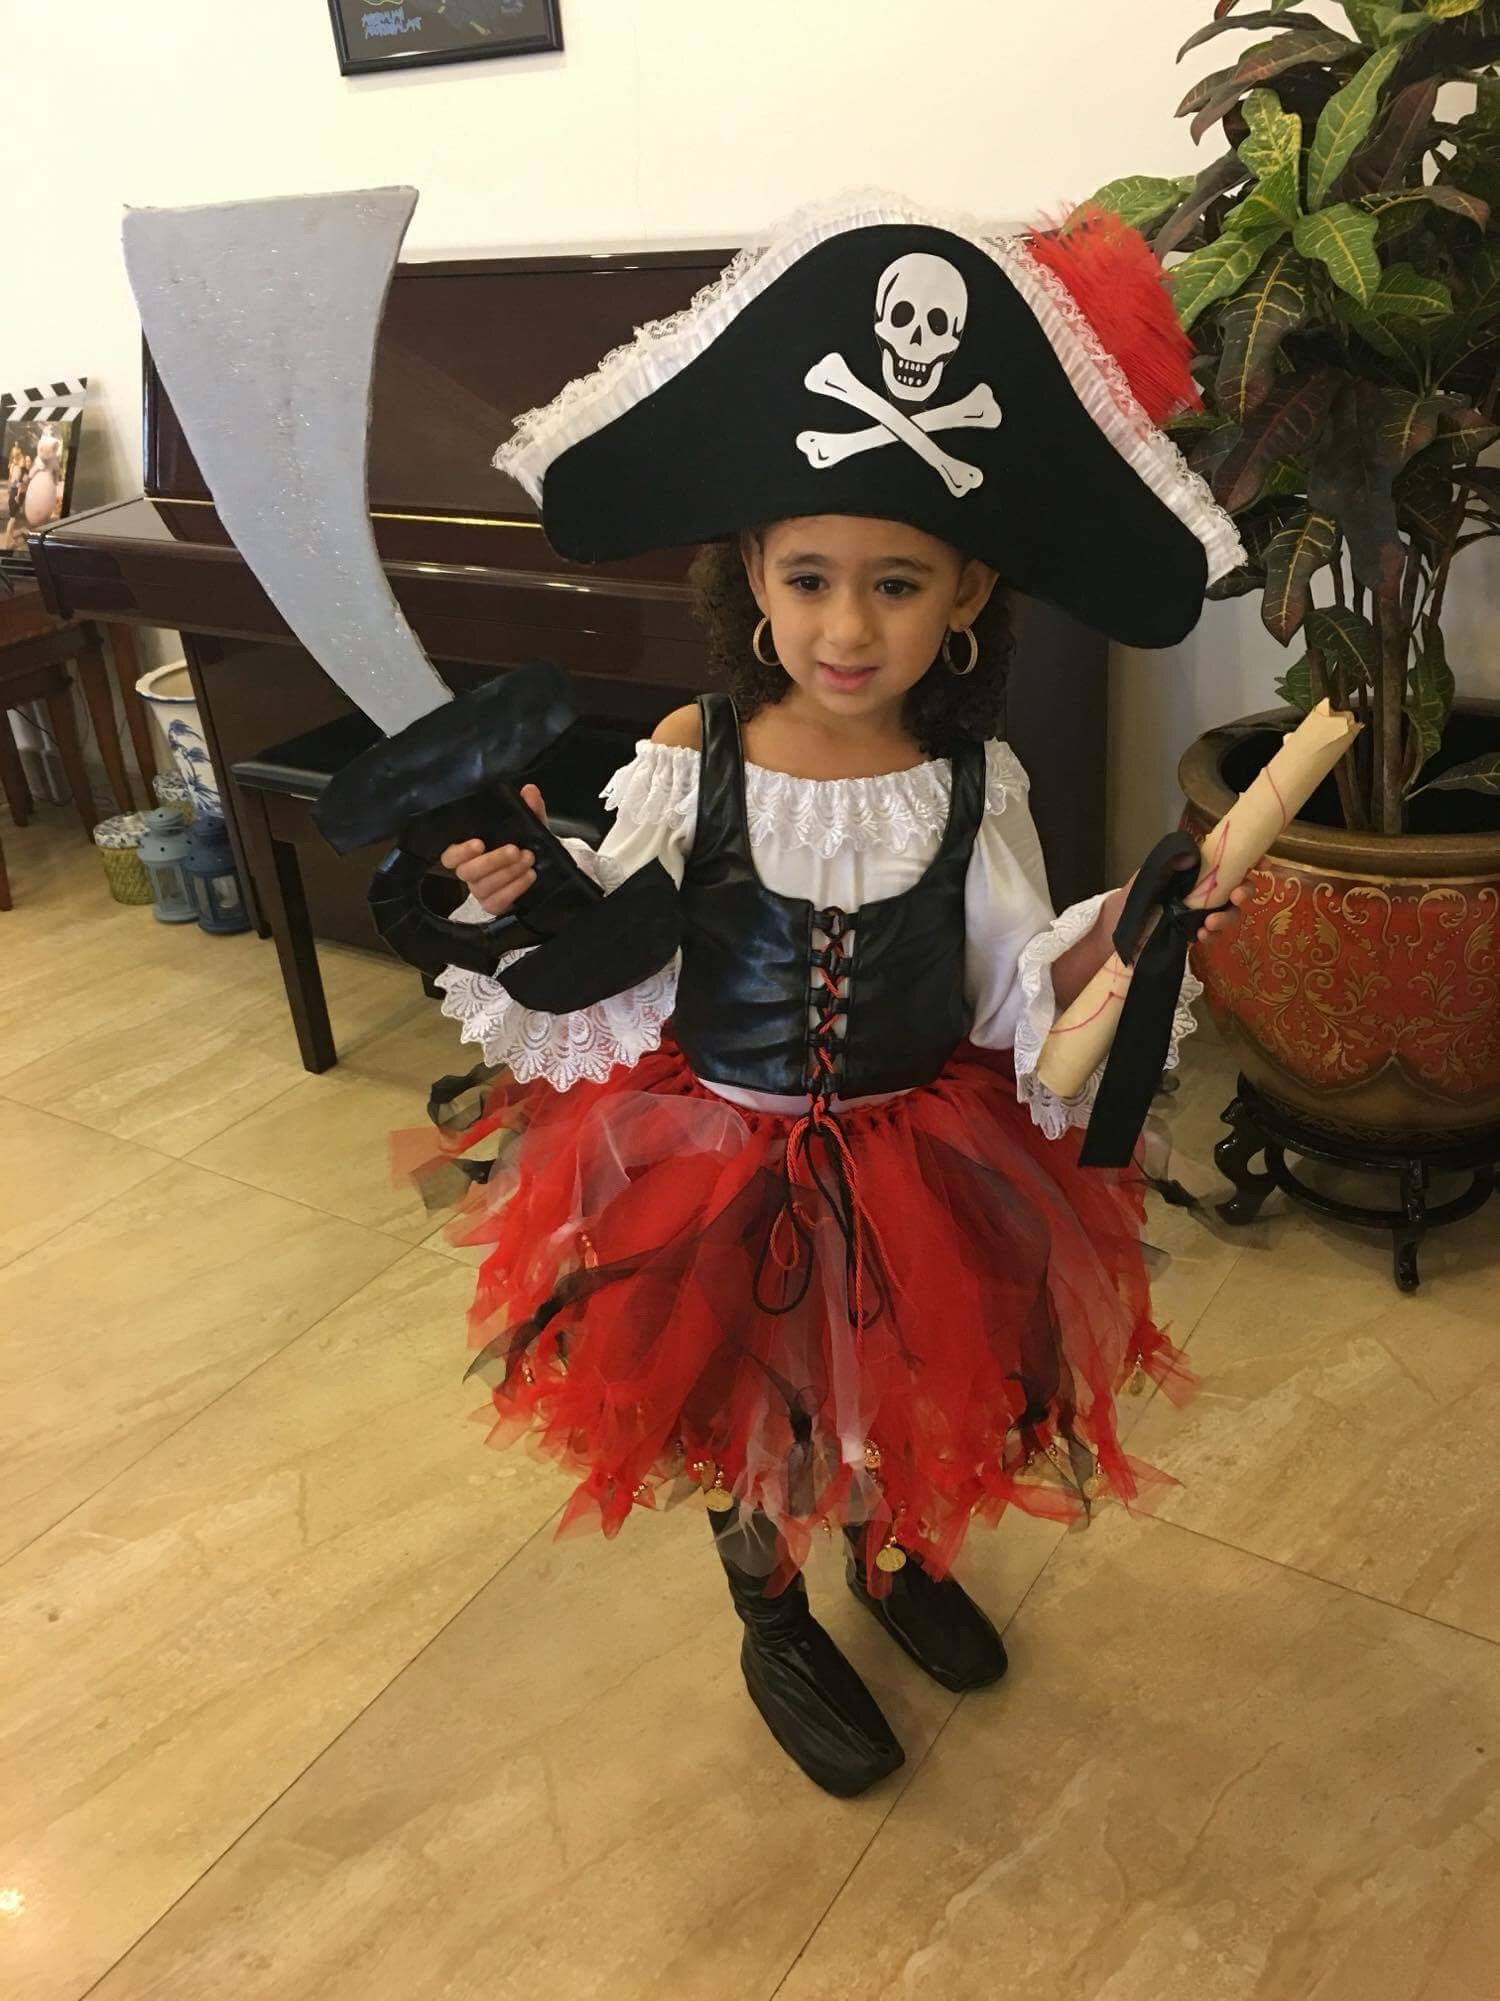 Childens Fancy Dress Pirate Eva Hat Black with skull and crossbones